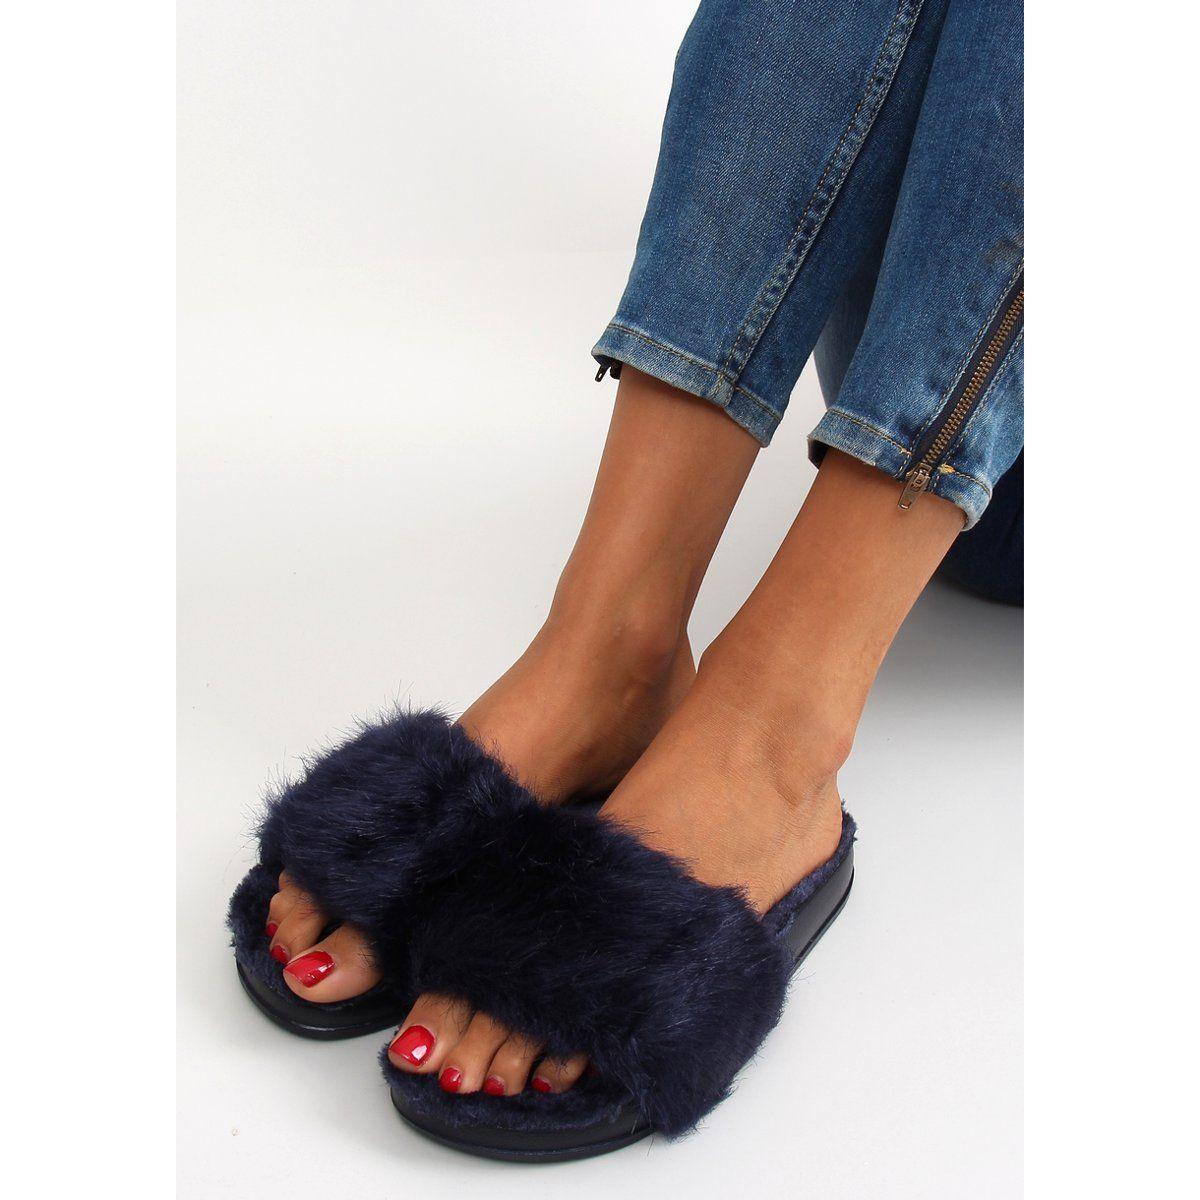 Klapki Futrzane Dd68 Blue Granatowe Fashion Shoes Fur Slides